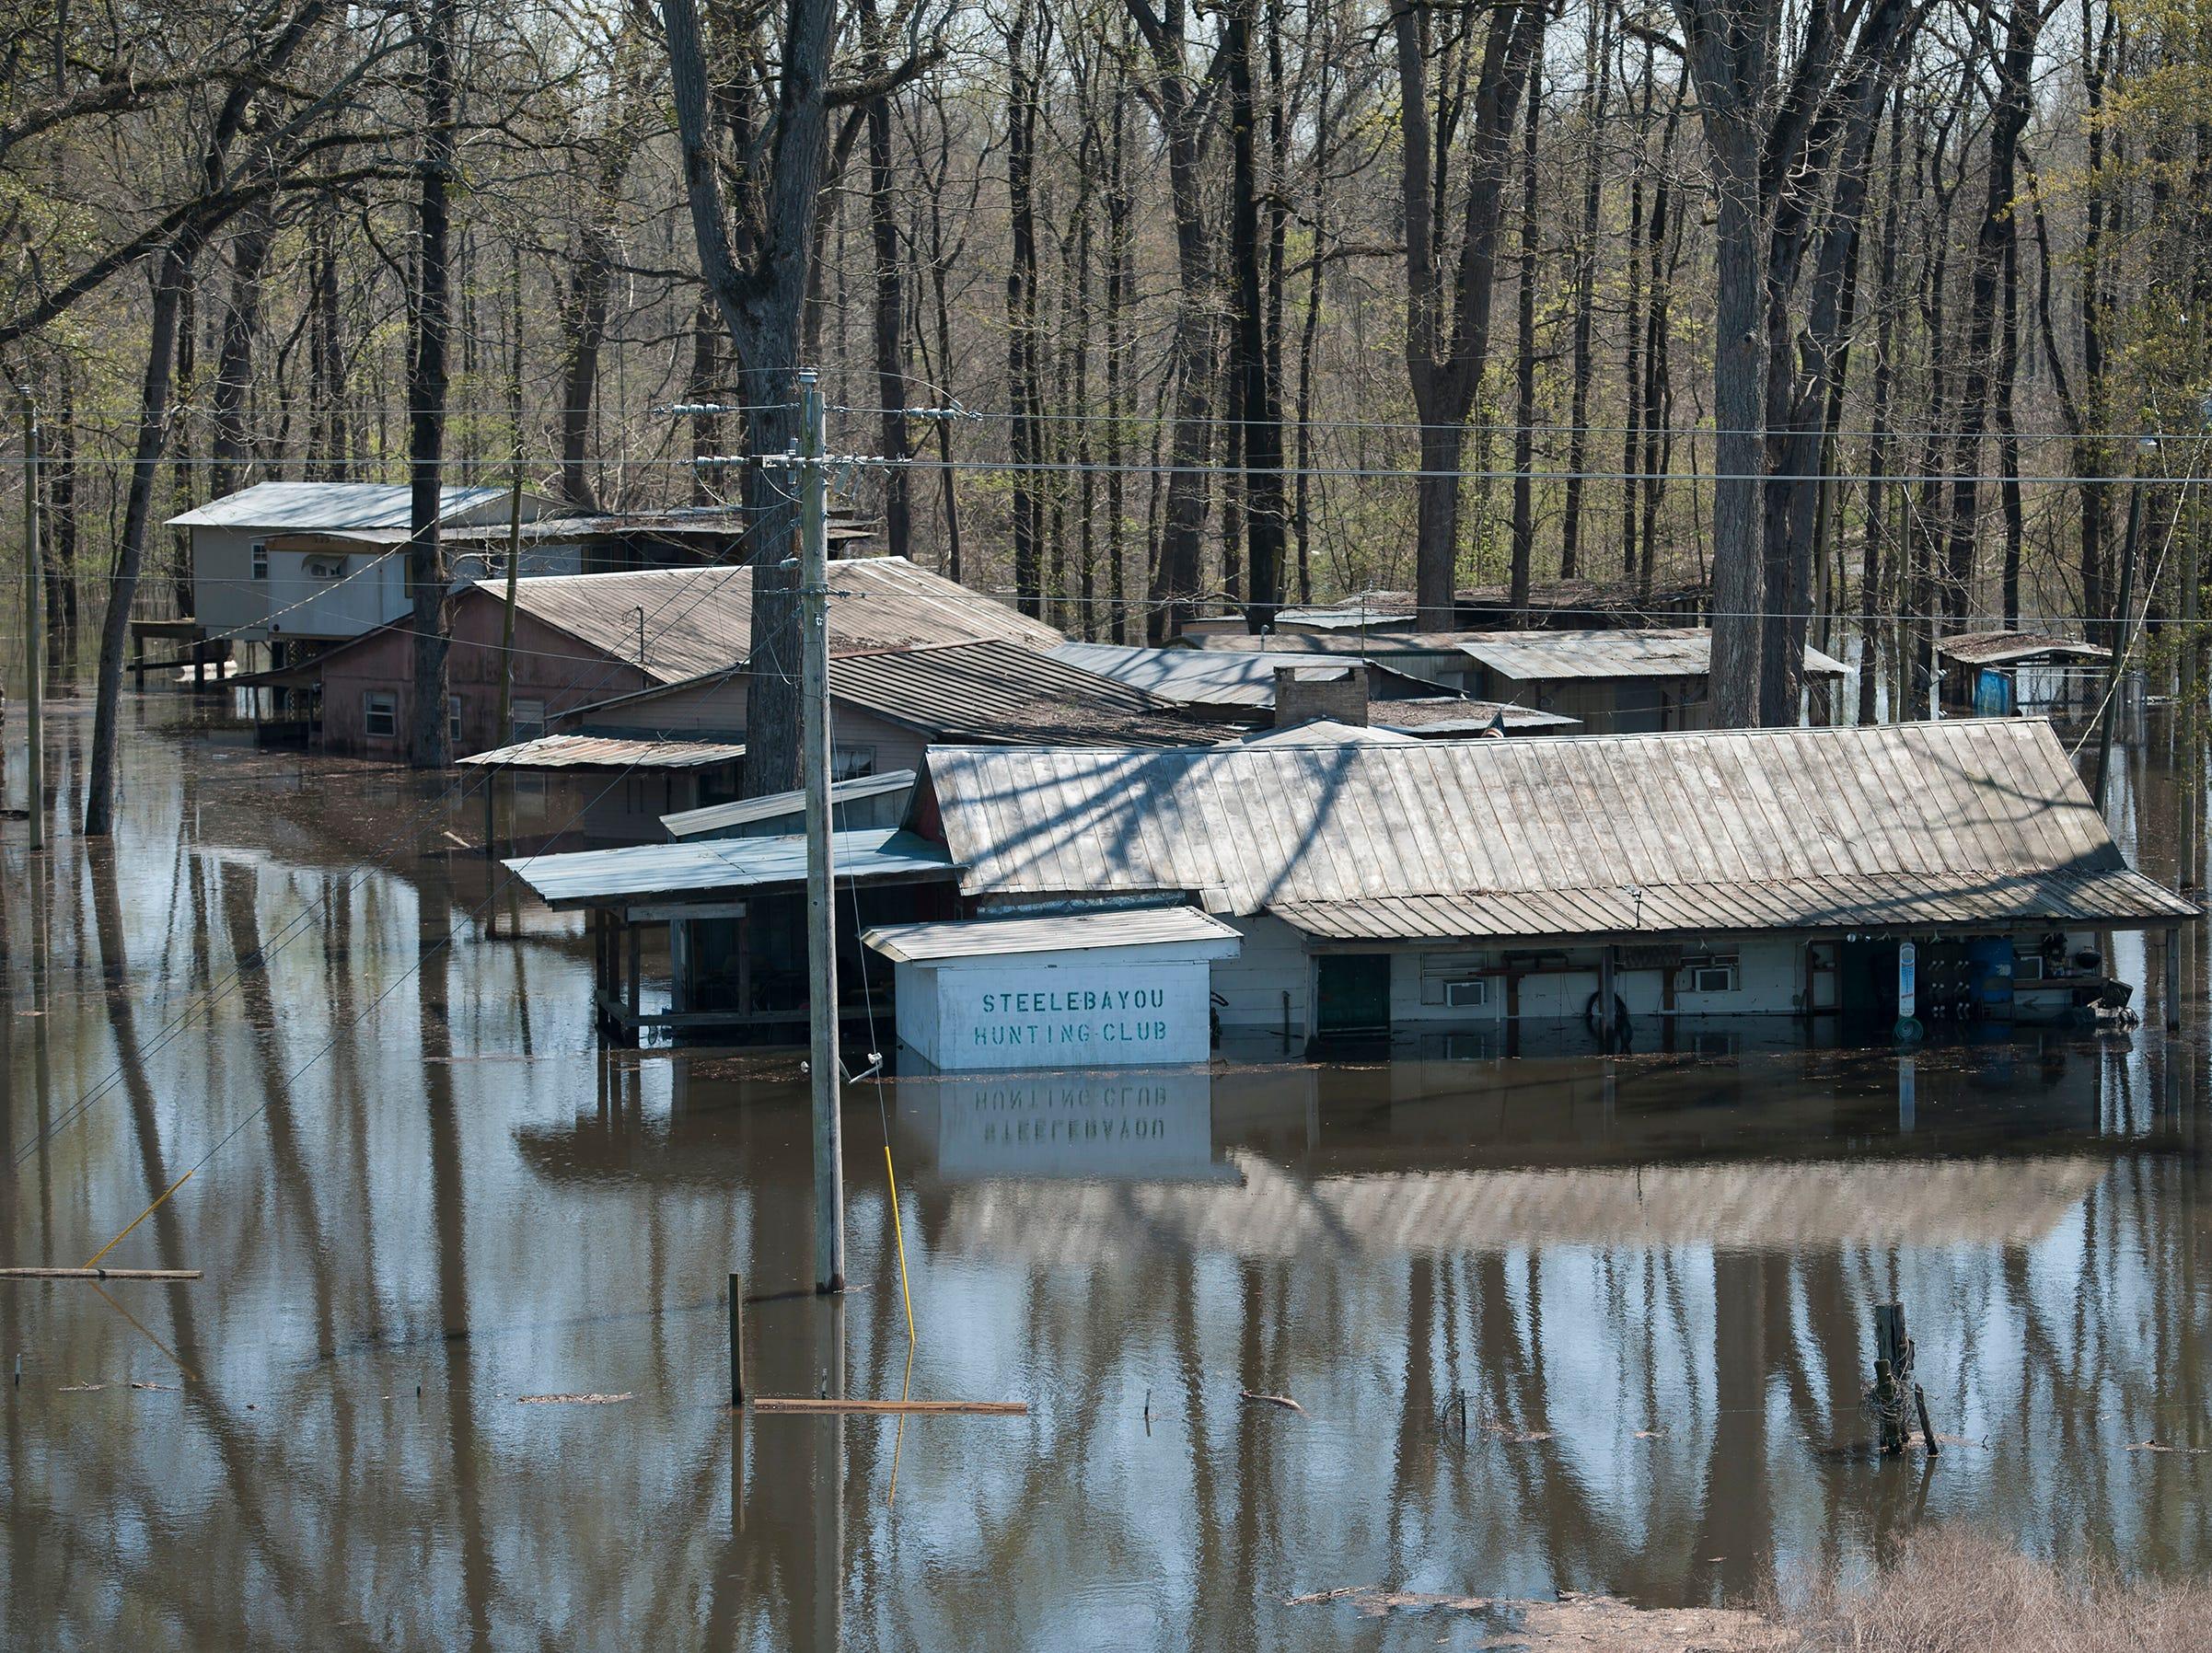 Backwater flooding surrounds Steele Bayou Hunting Club along MS 465 in Warren County.